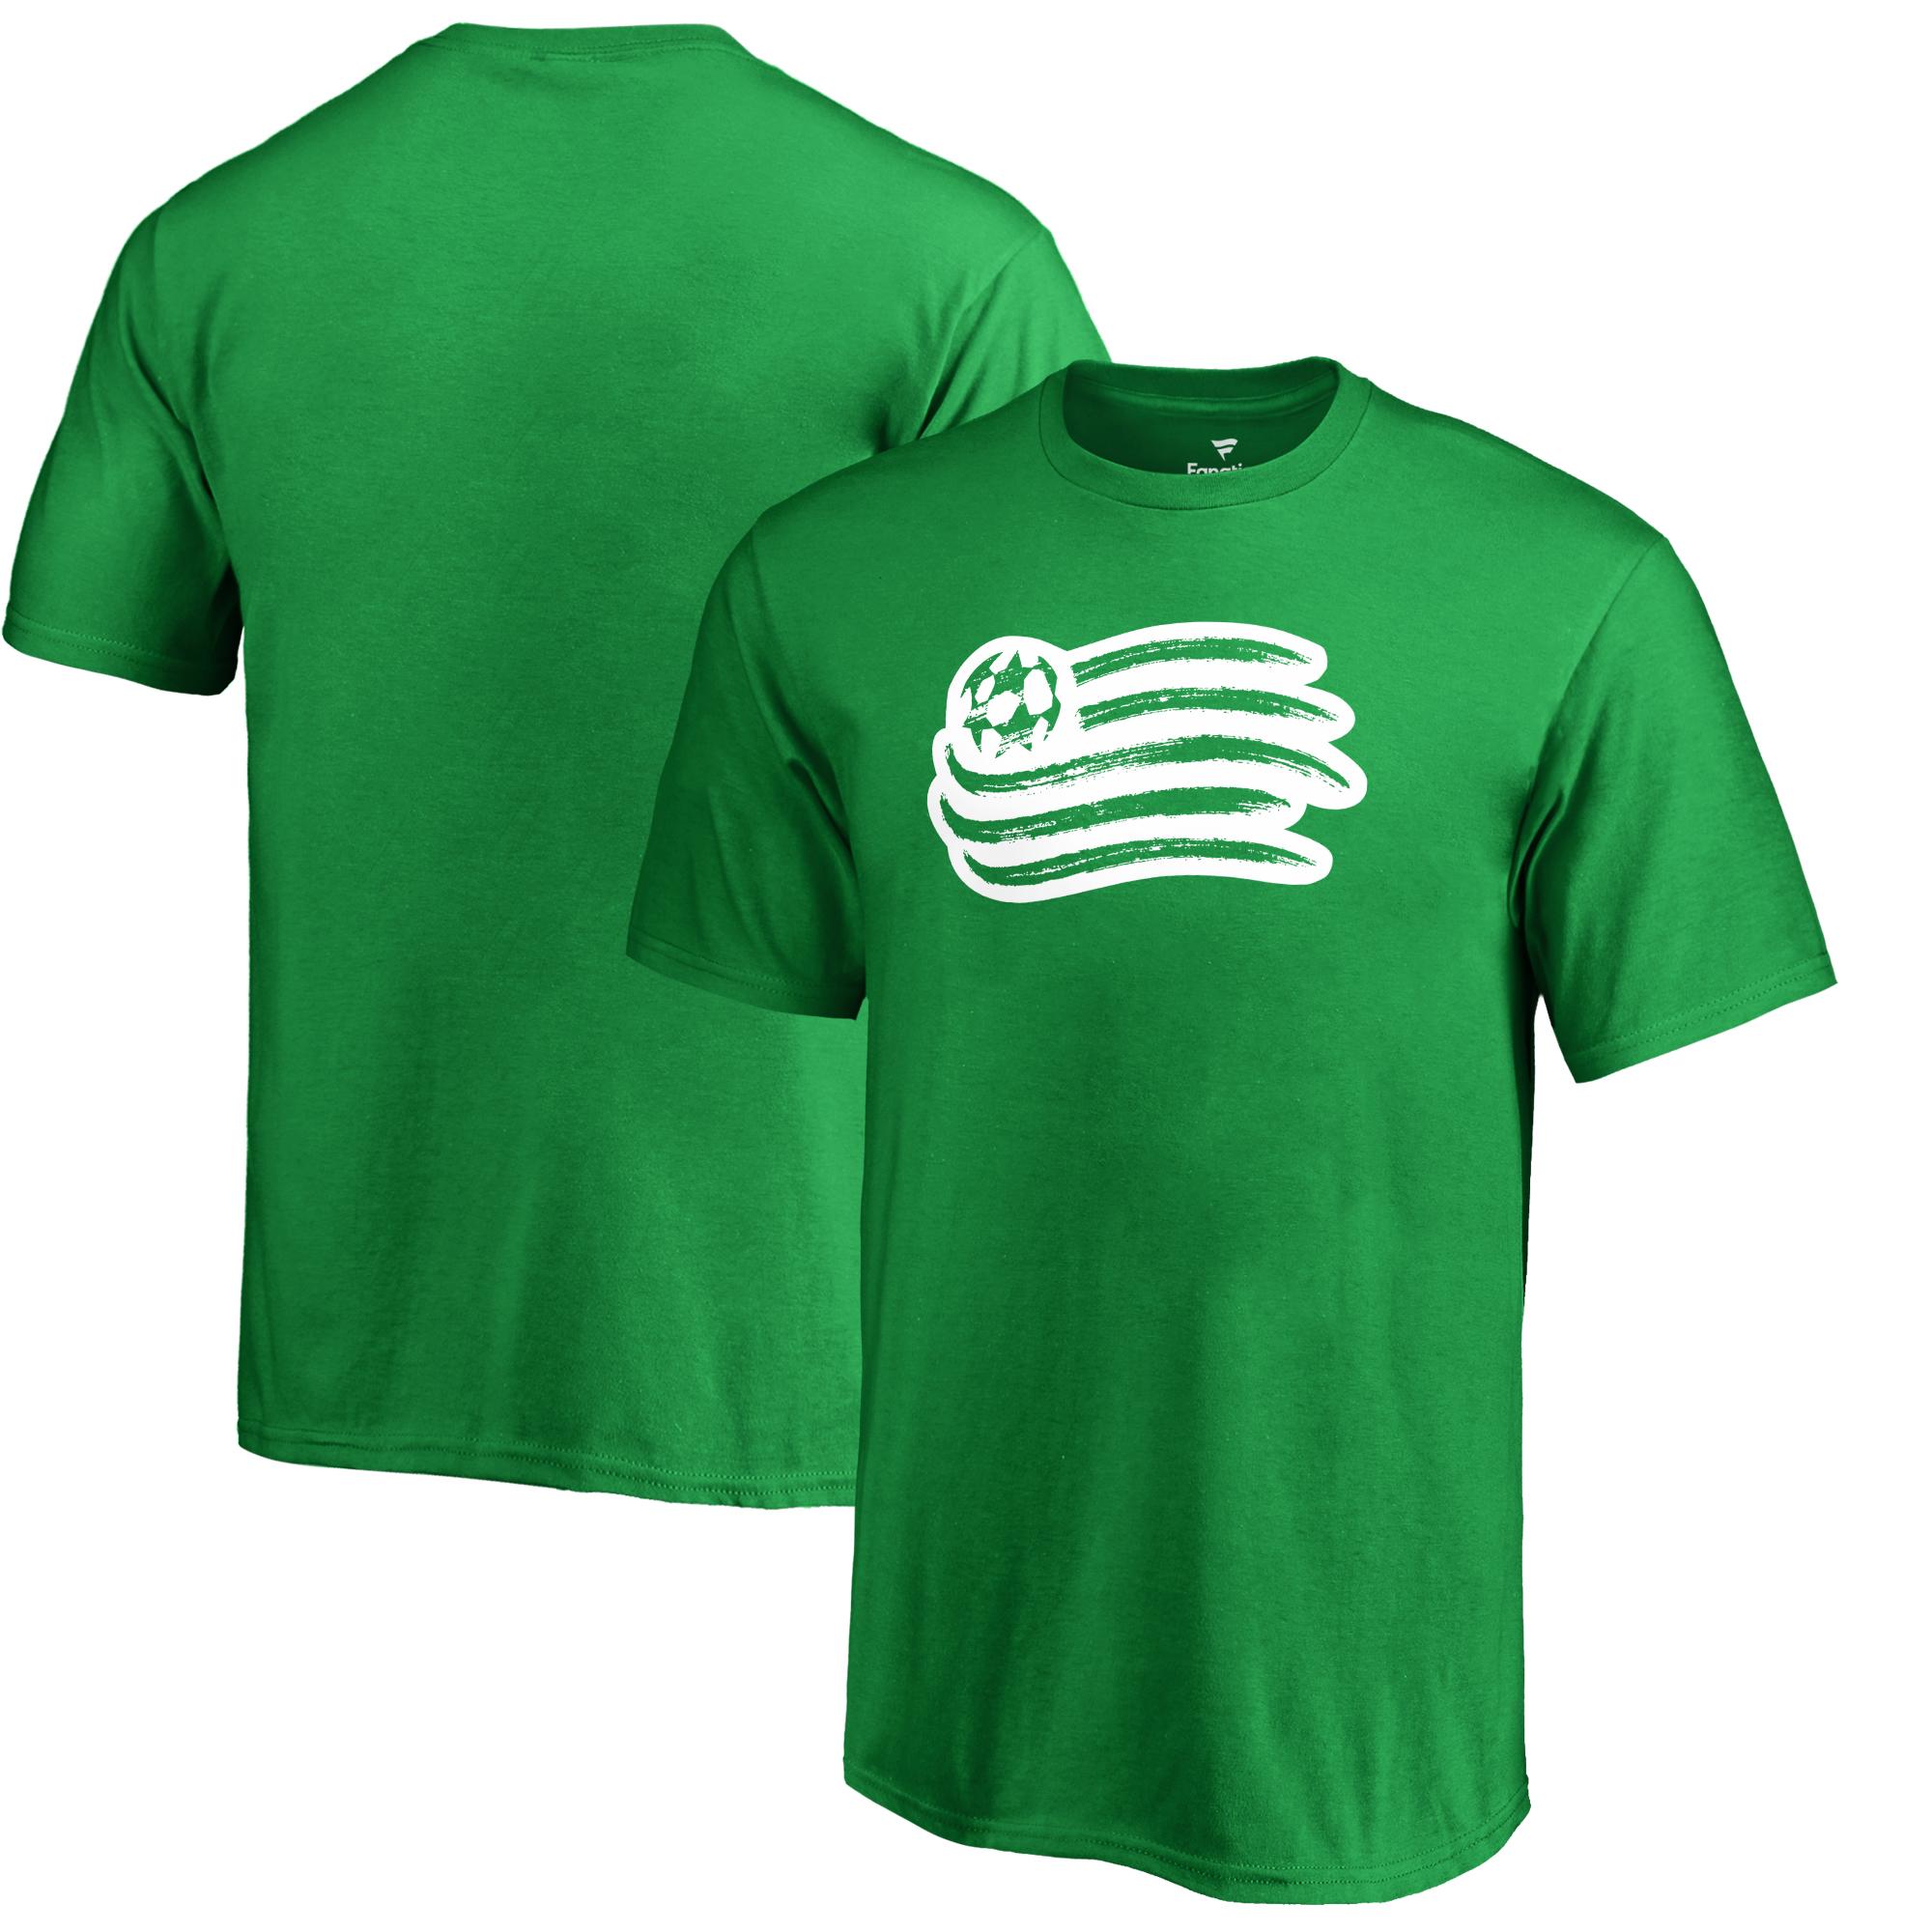 New England Revolution Fanatics Branded Youth St. Patrick's Day White Logo T-Shirt - Kelly Green